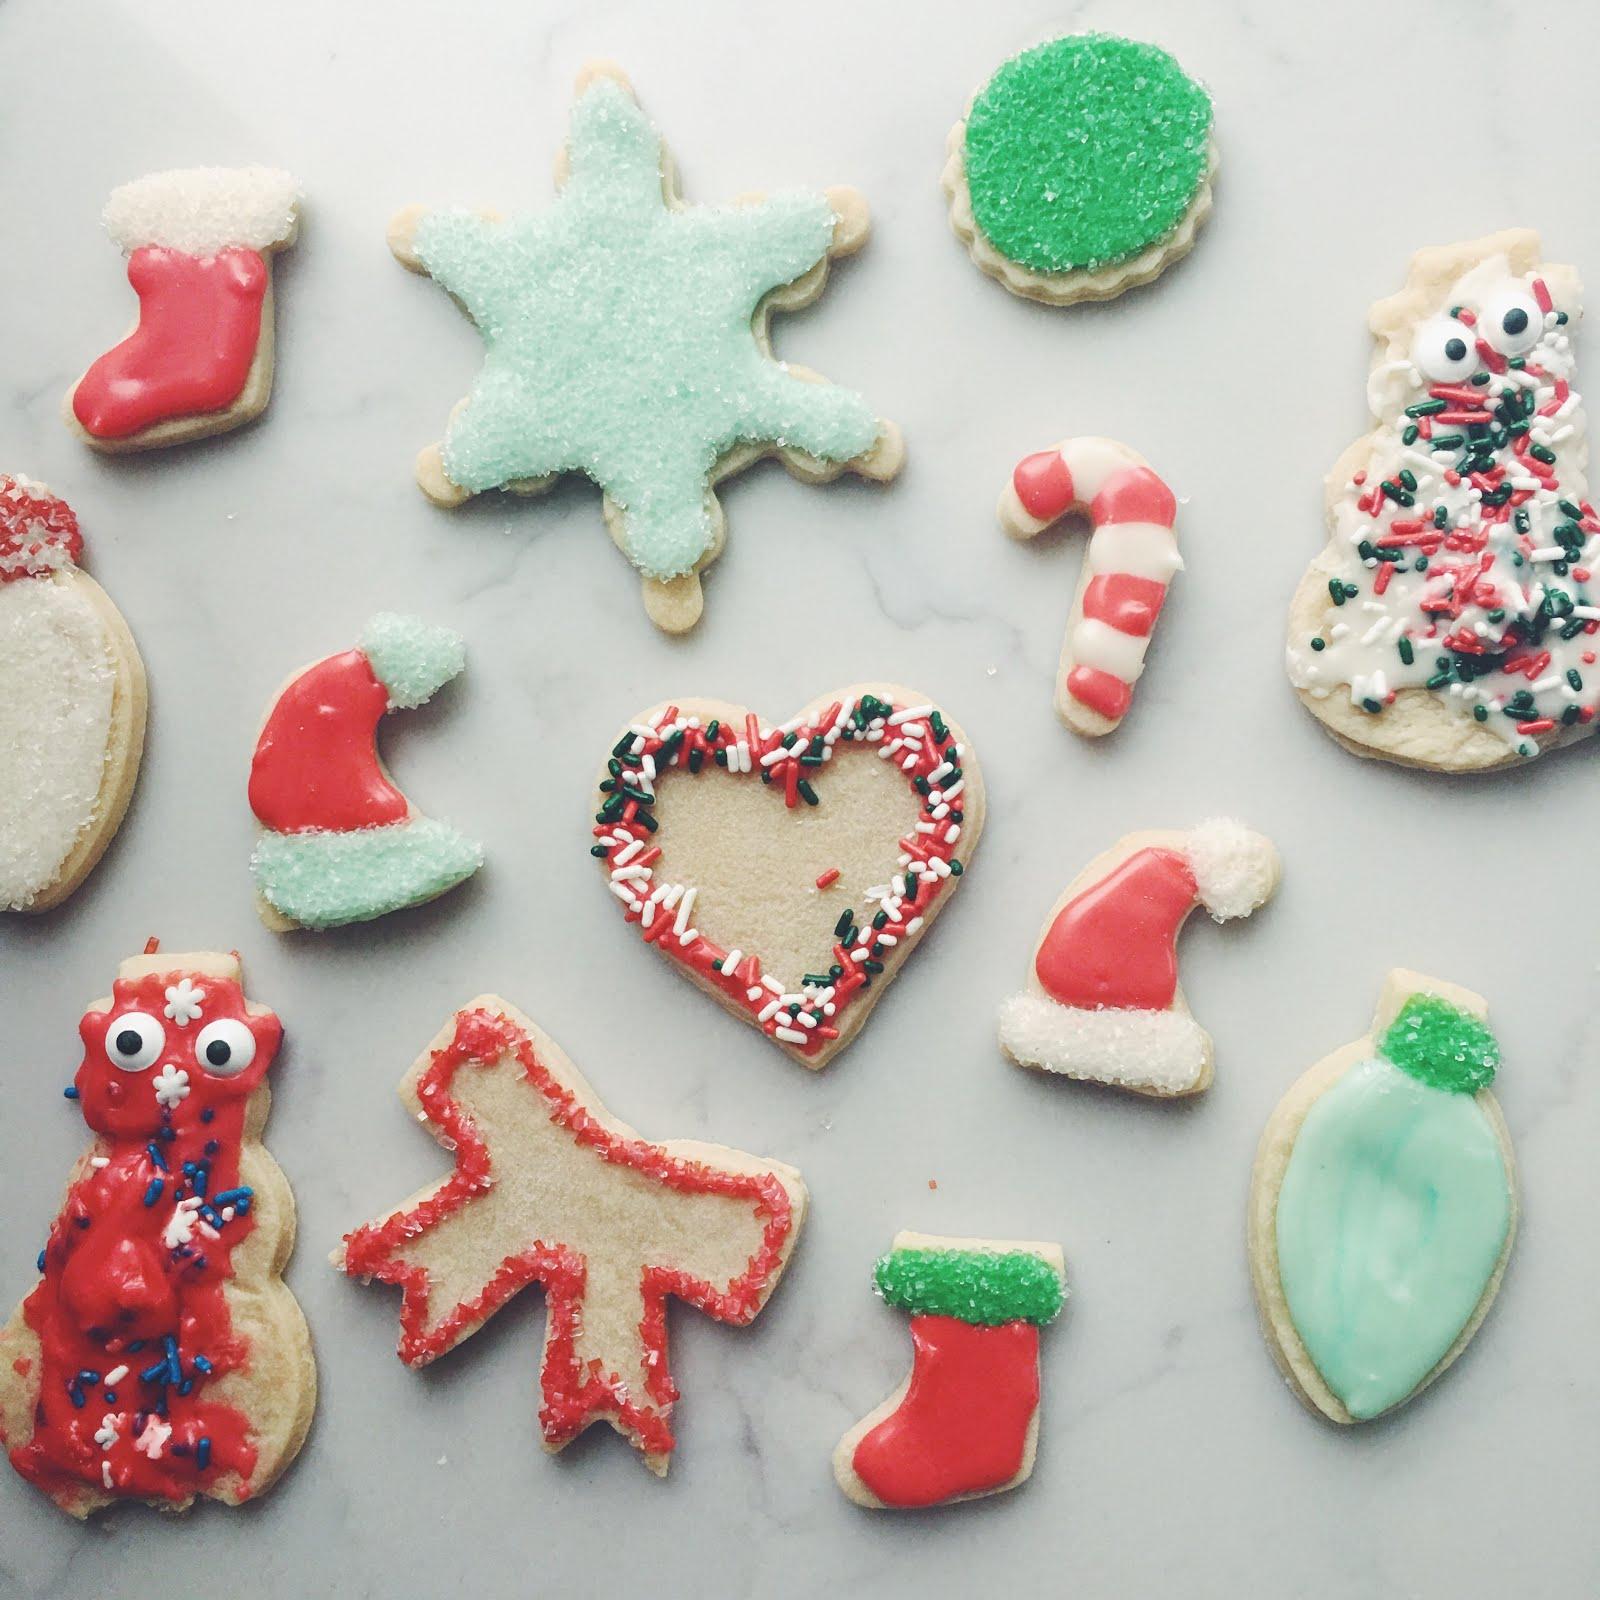 HEN & CO. : Christmas Sugar Cookies!